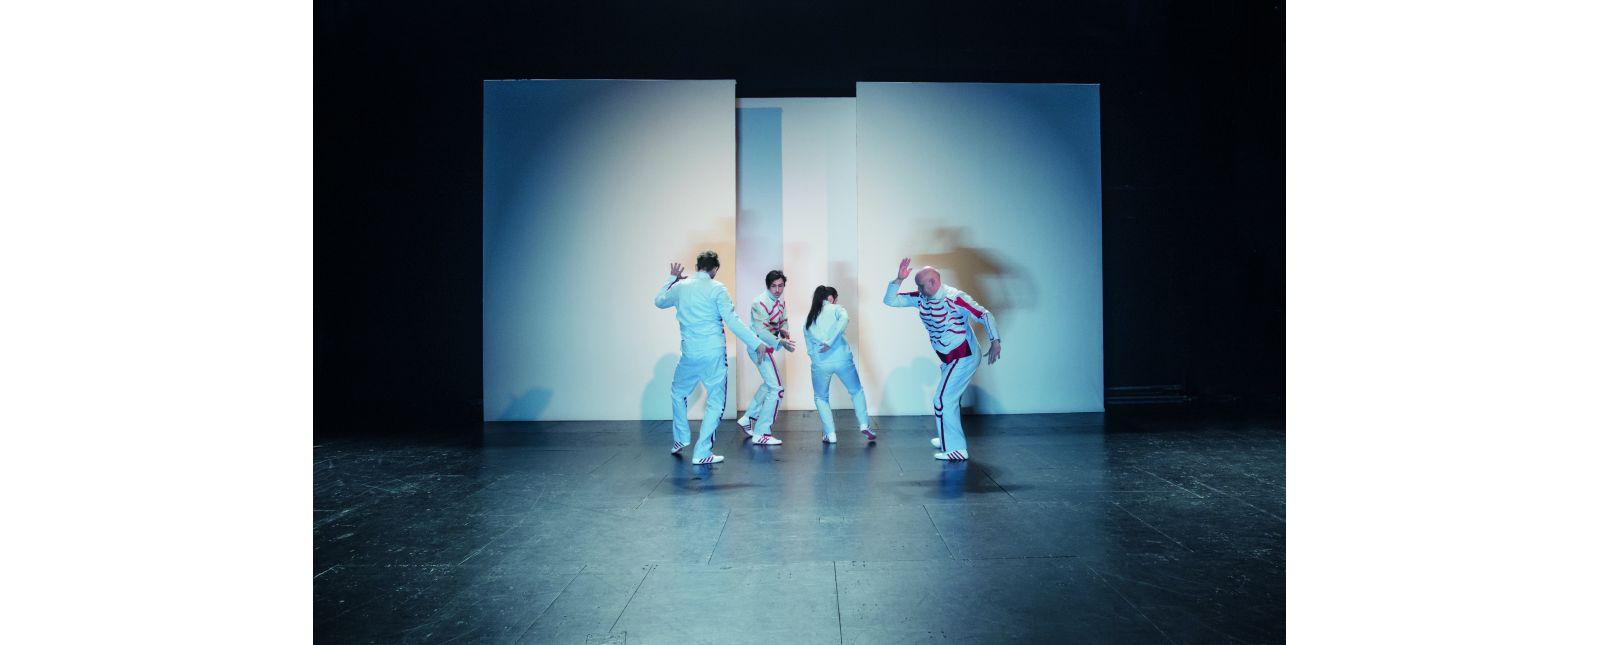 Der Teufel mit den drei goldenen Haaren // Martin Müller-Reisinger, Lukas Hupfeld, Rosa Thormeyer, Showcase Beat Le Mot // MINZ&KUNST PHOTOGRAPHY // 2018